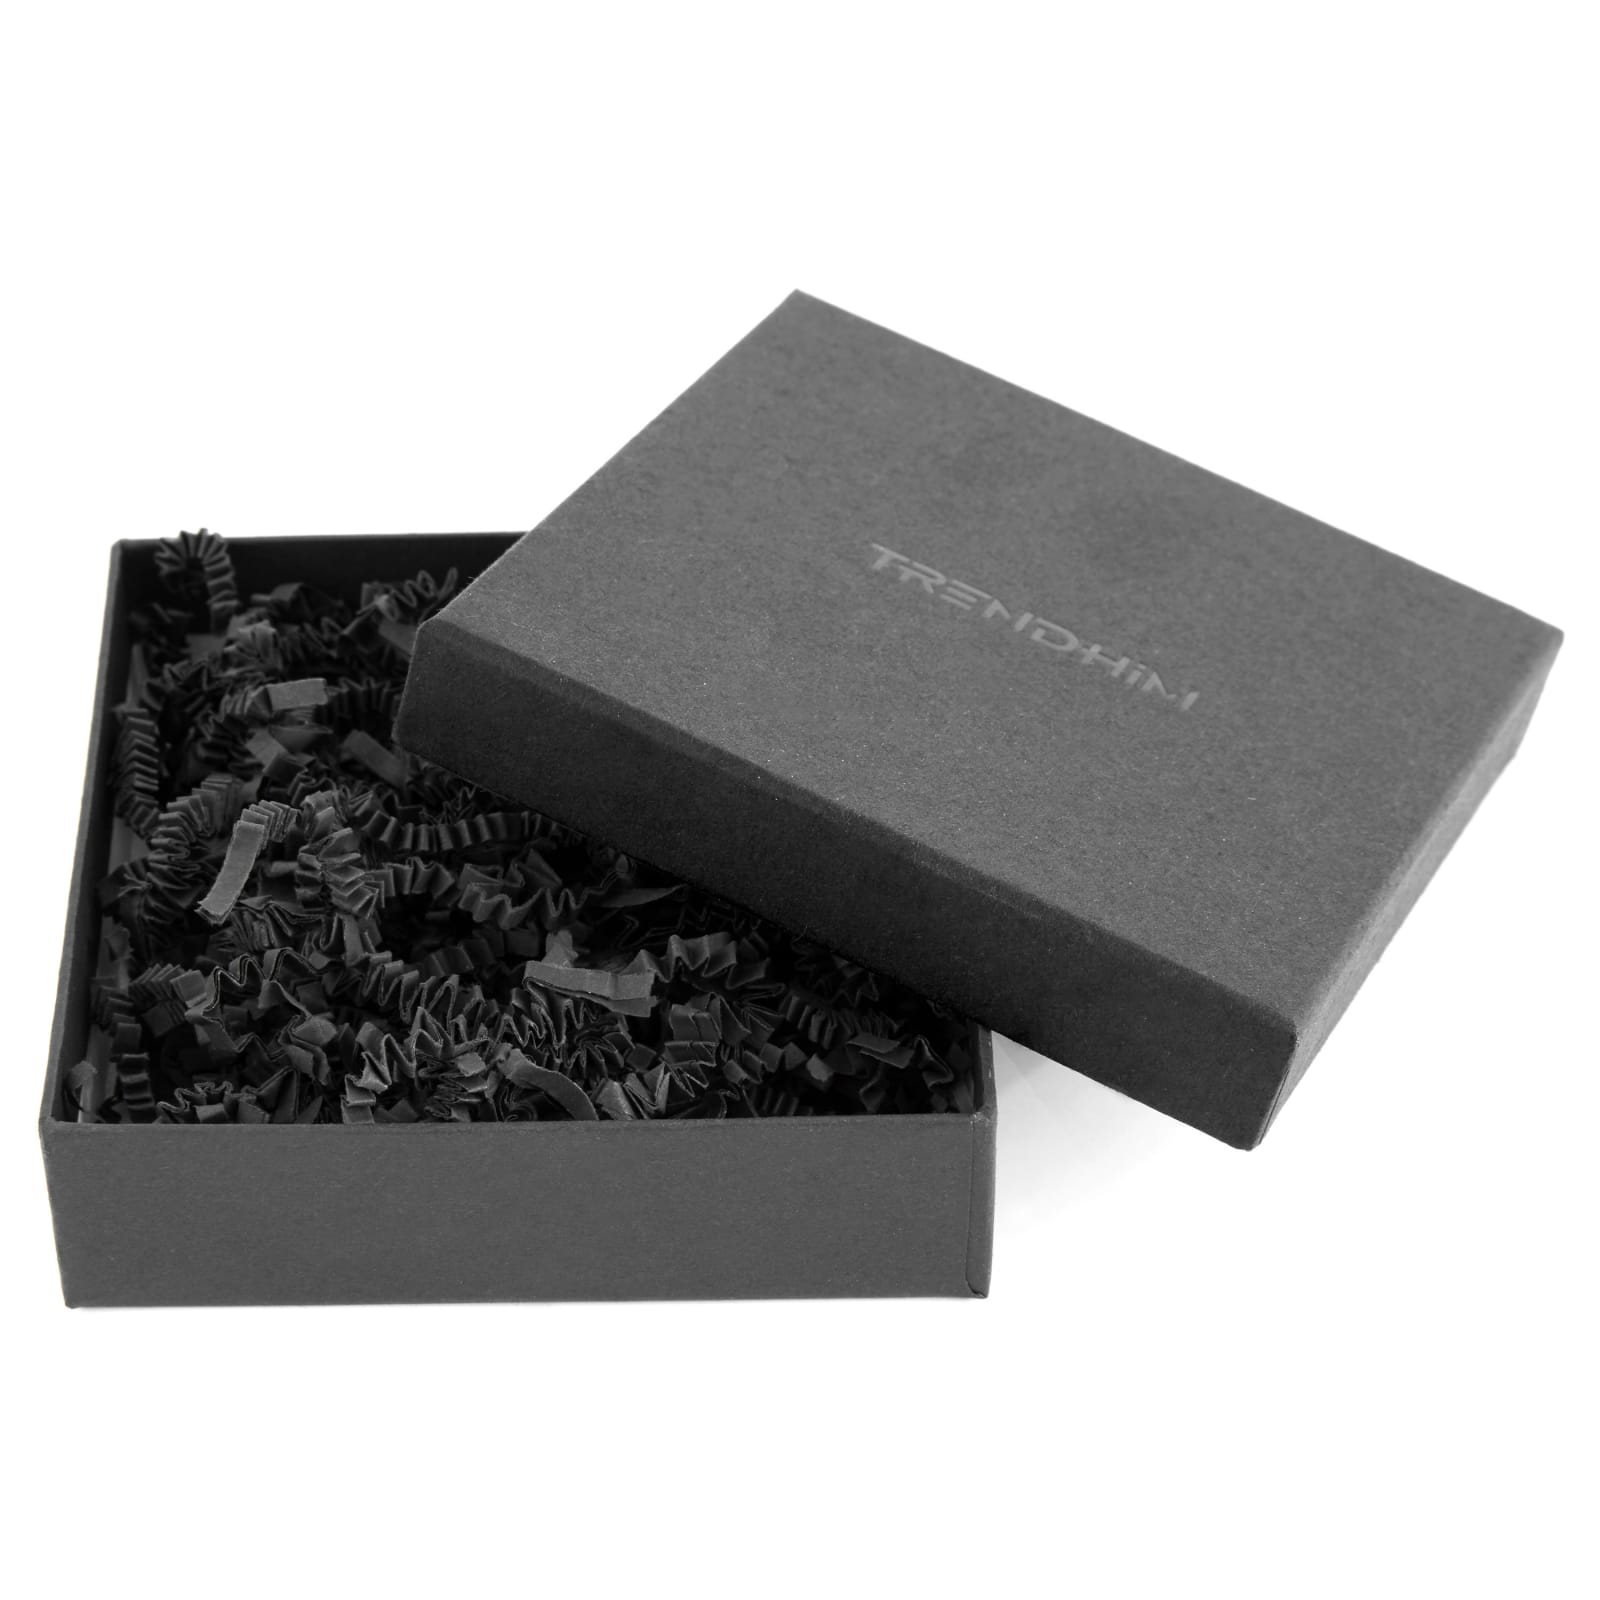 cdfd6719ec9 Κουτί Δώρου Universal